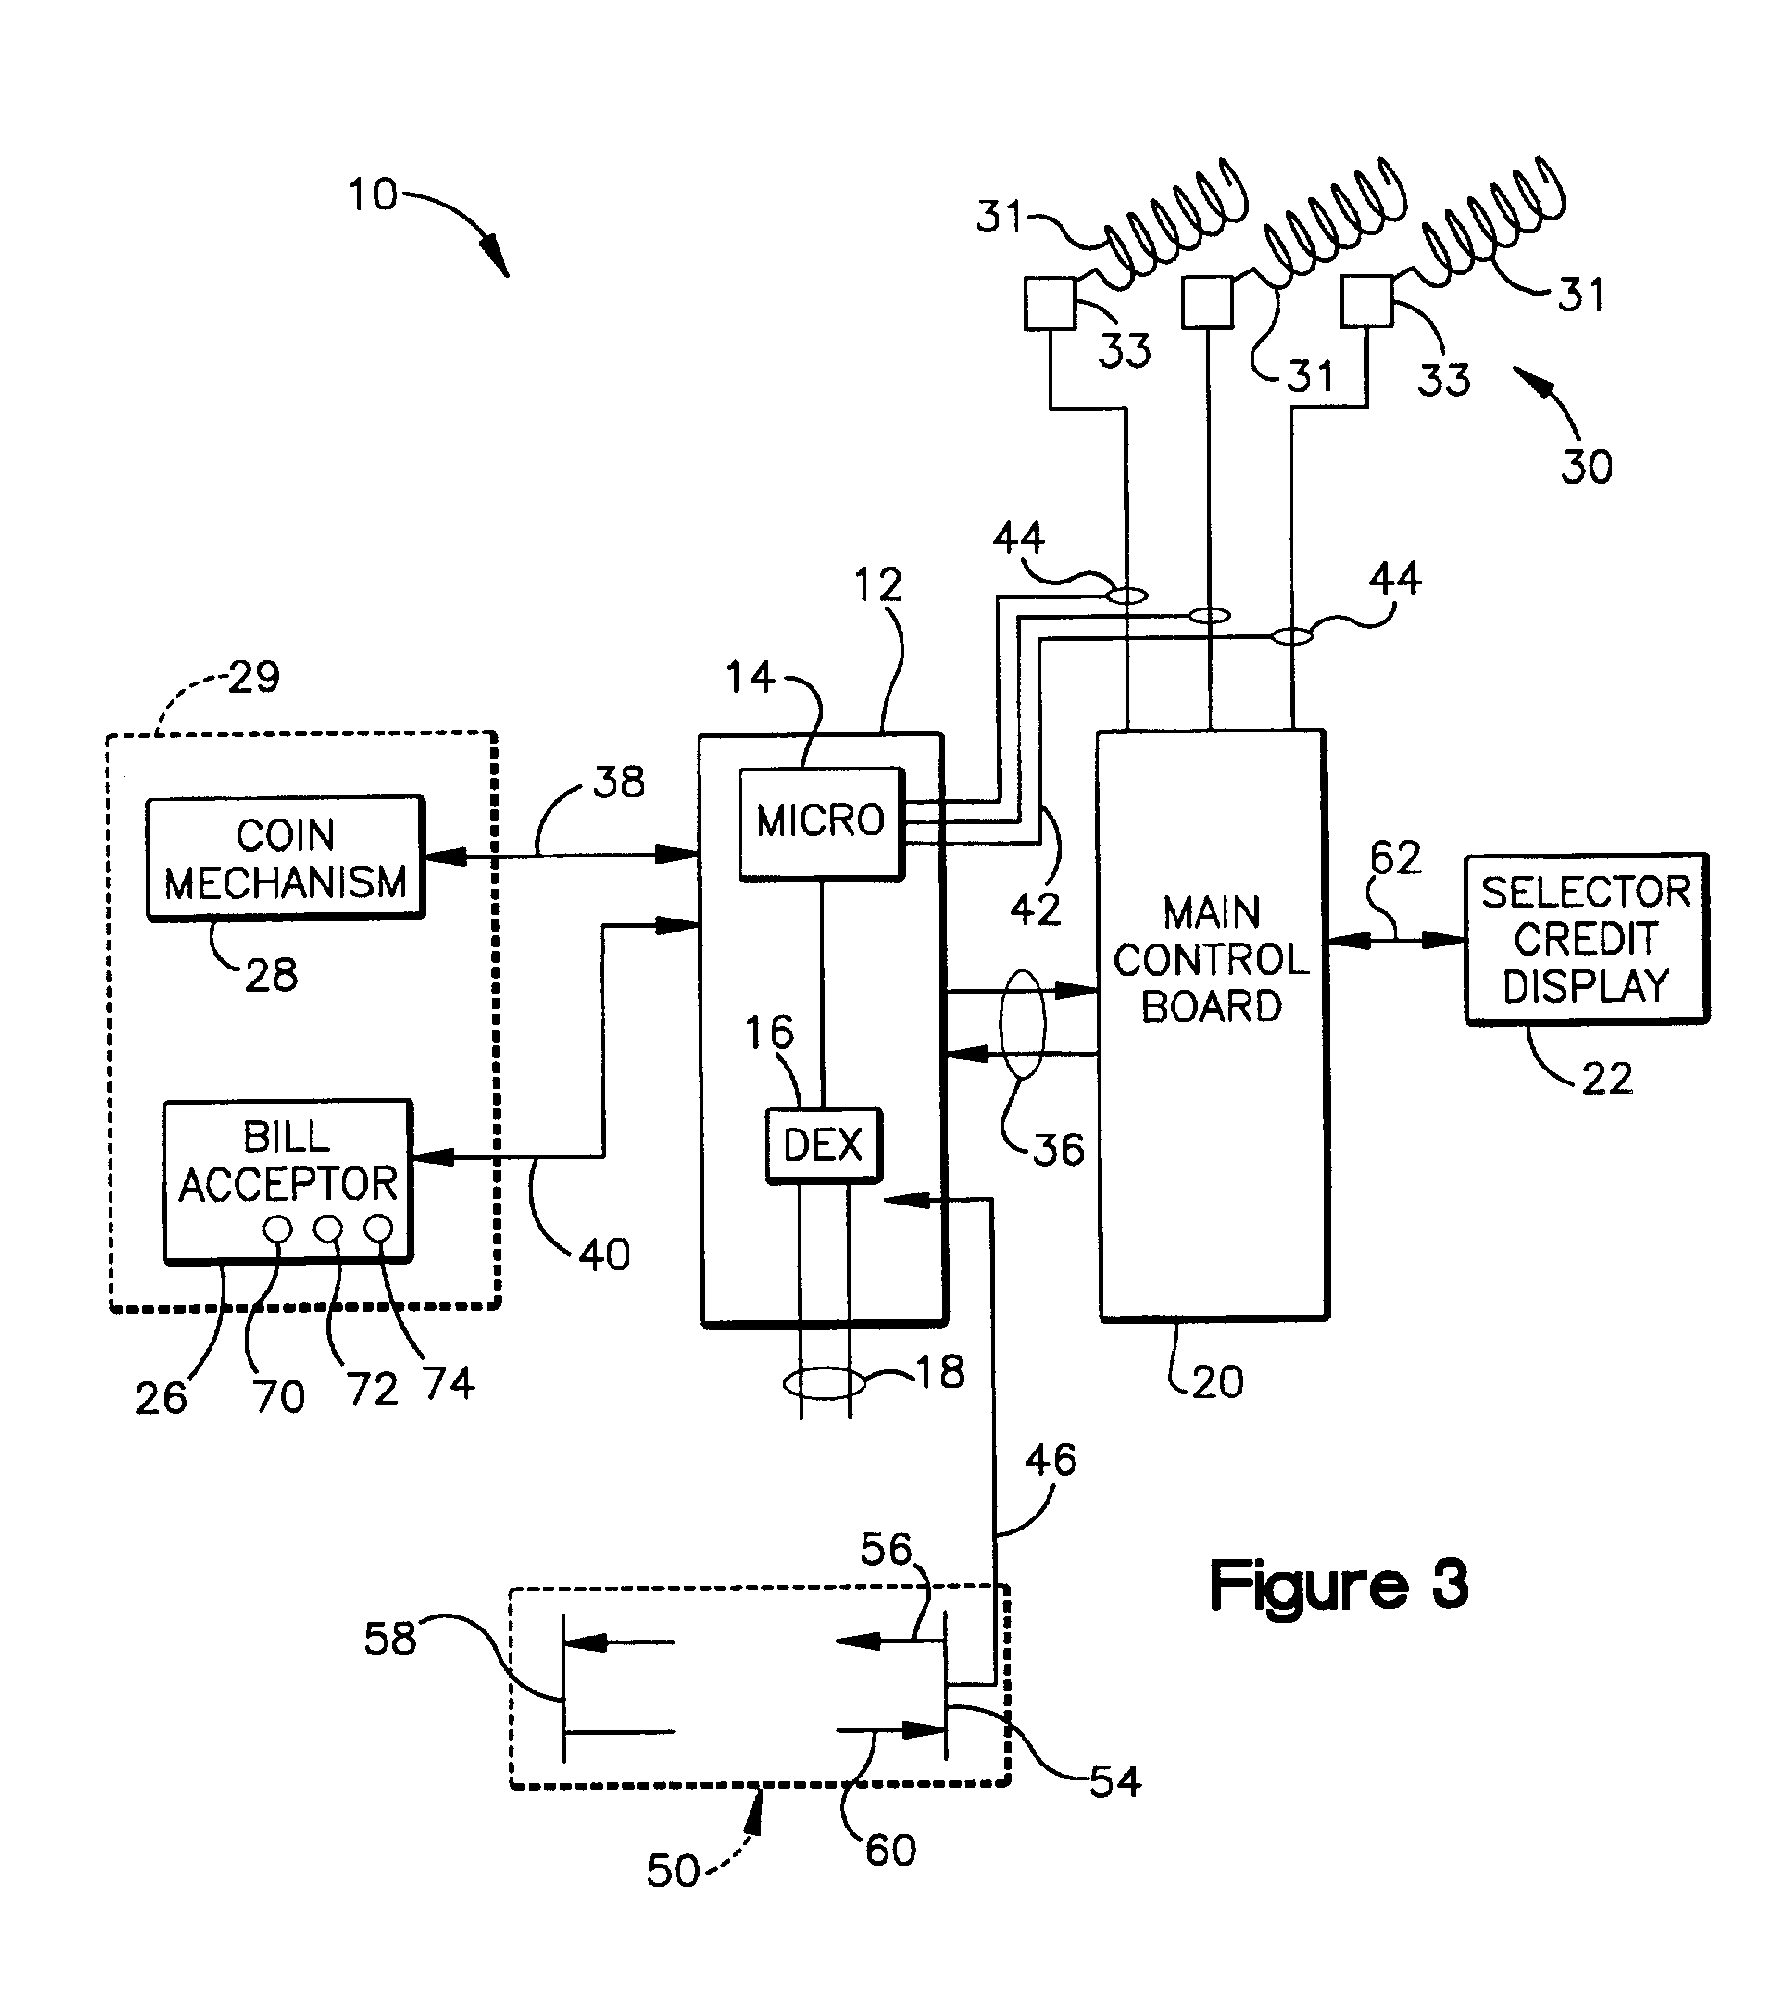 Westinghouse Golf Cart Wiring Diagram : Ezgo wiring diagram get free image about